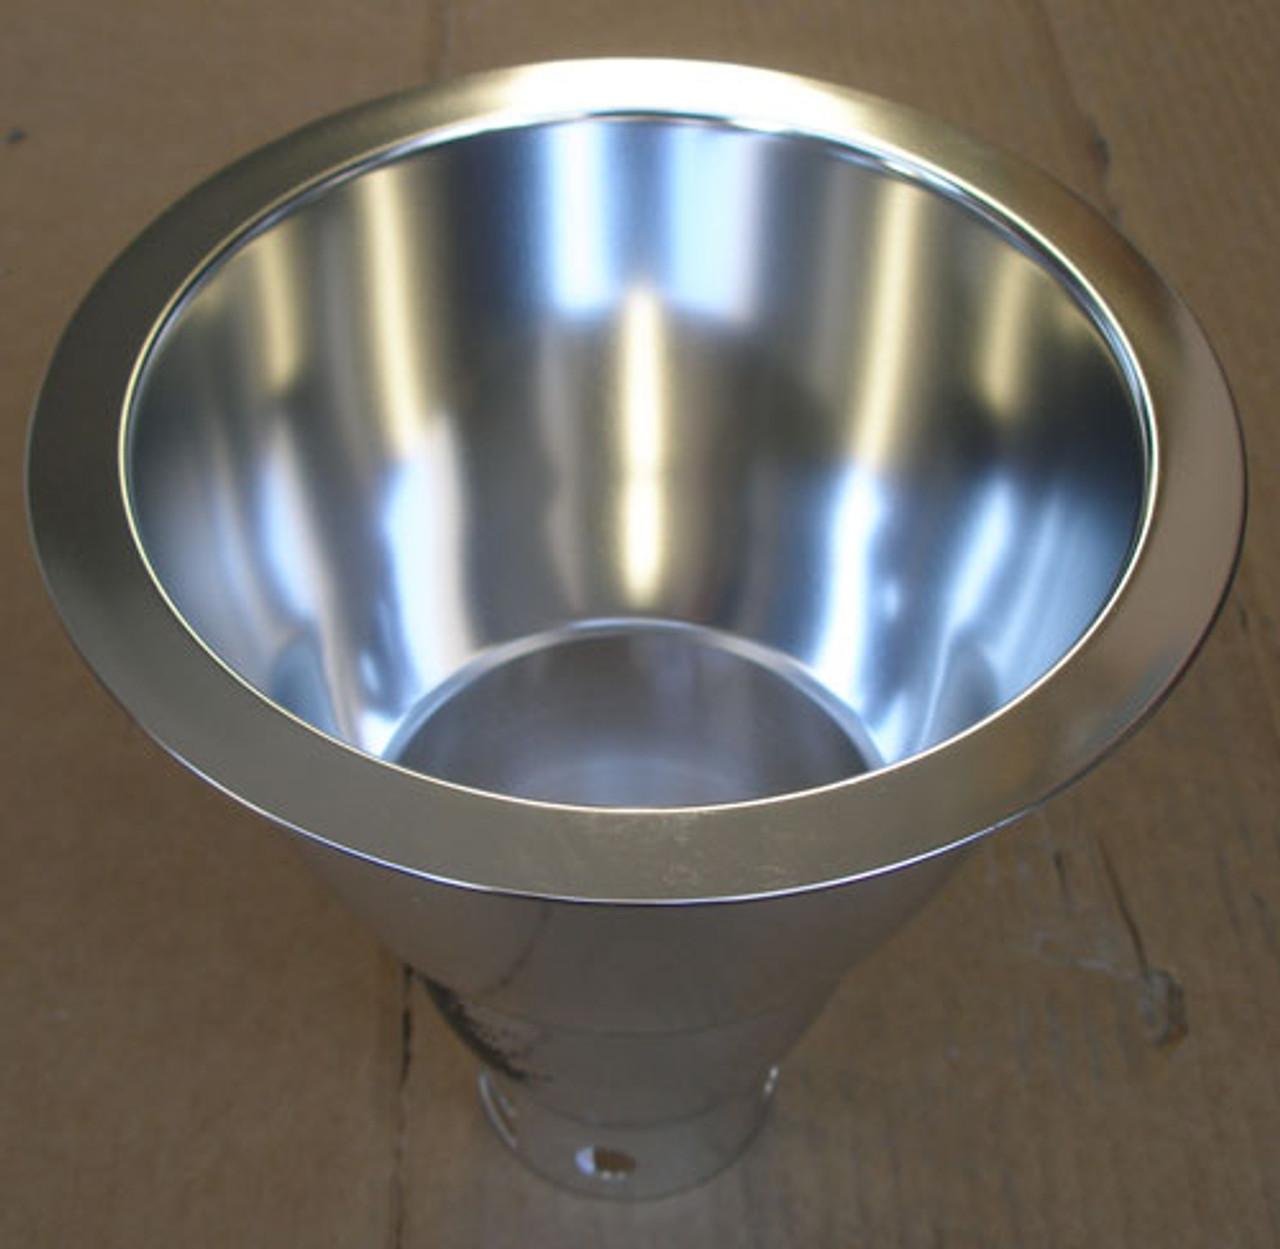 "Lightolier 8021CLP 6"" Aperture Triple Tube Downlight Reflector Trim - New"